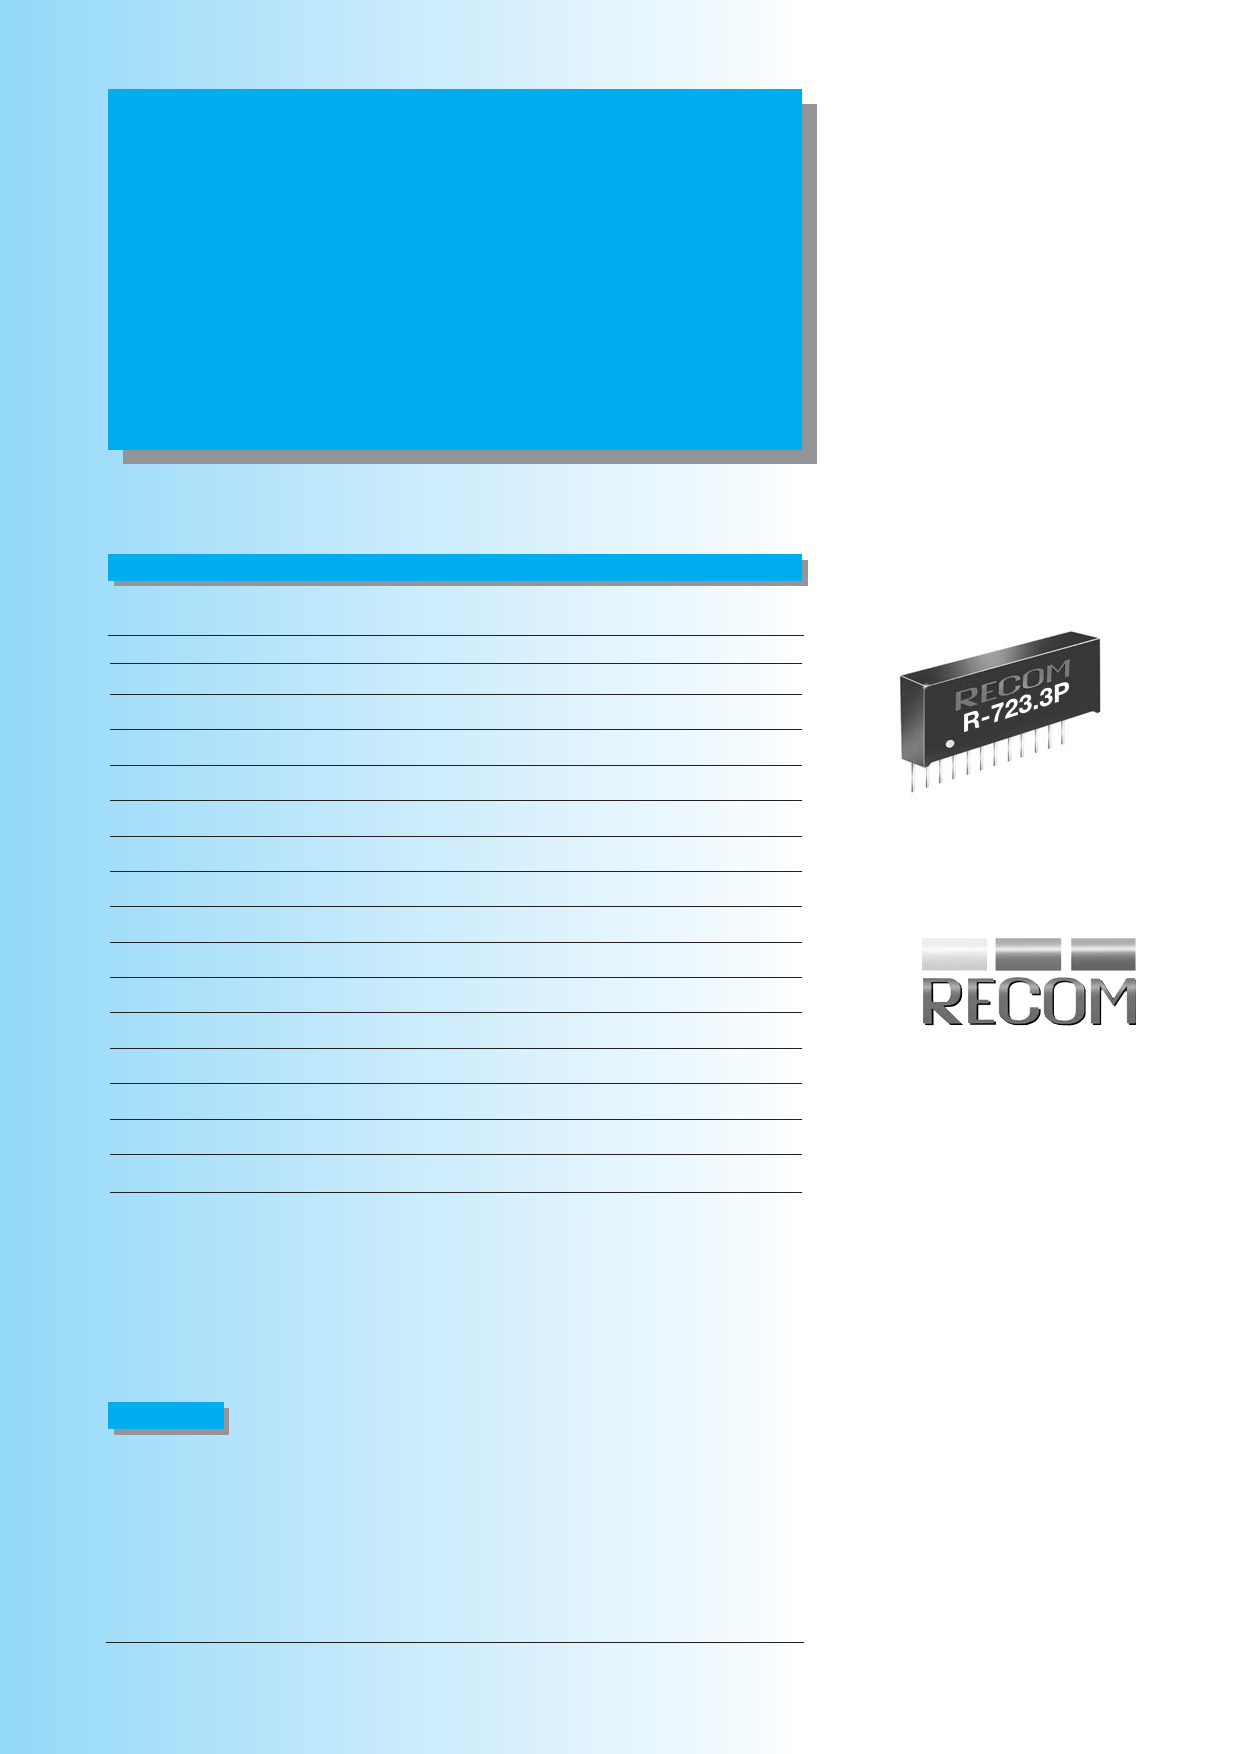 R-7xxxxD Hoja de datos, Descripción, Manual